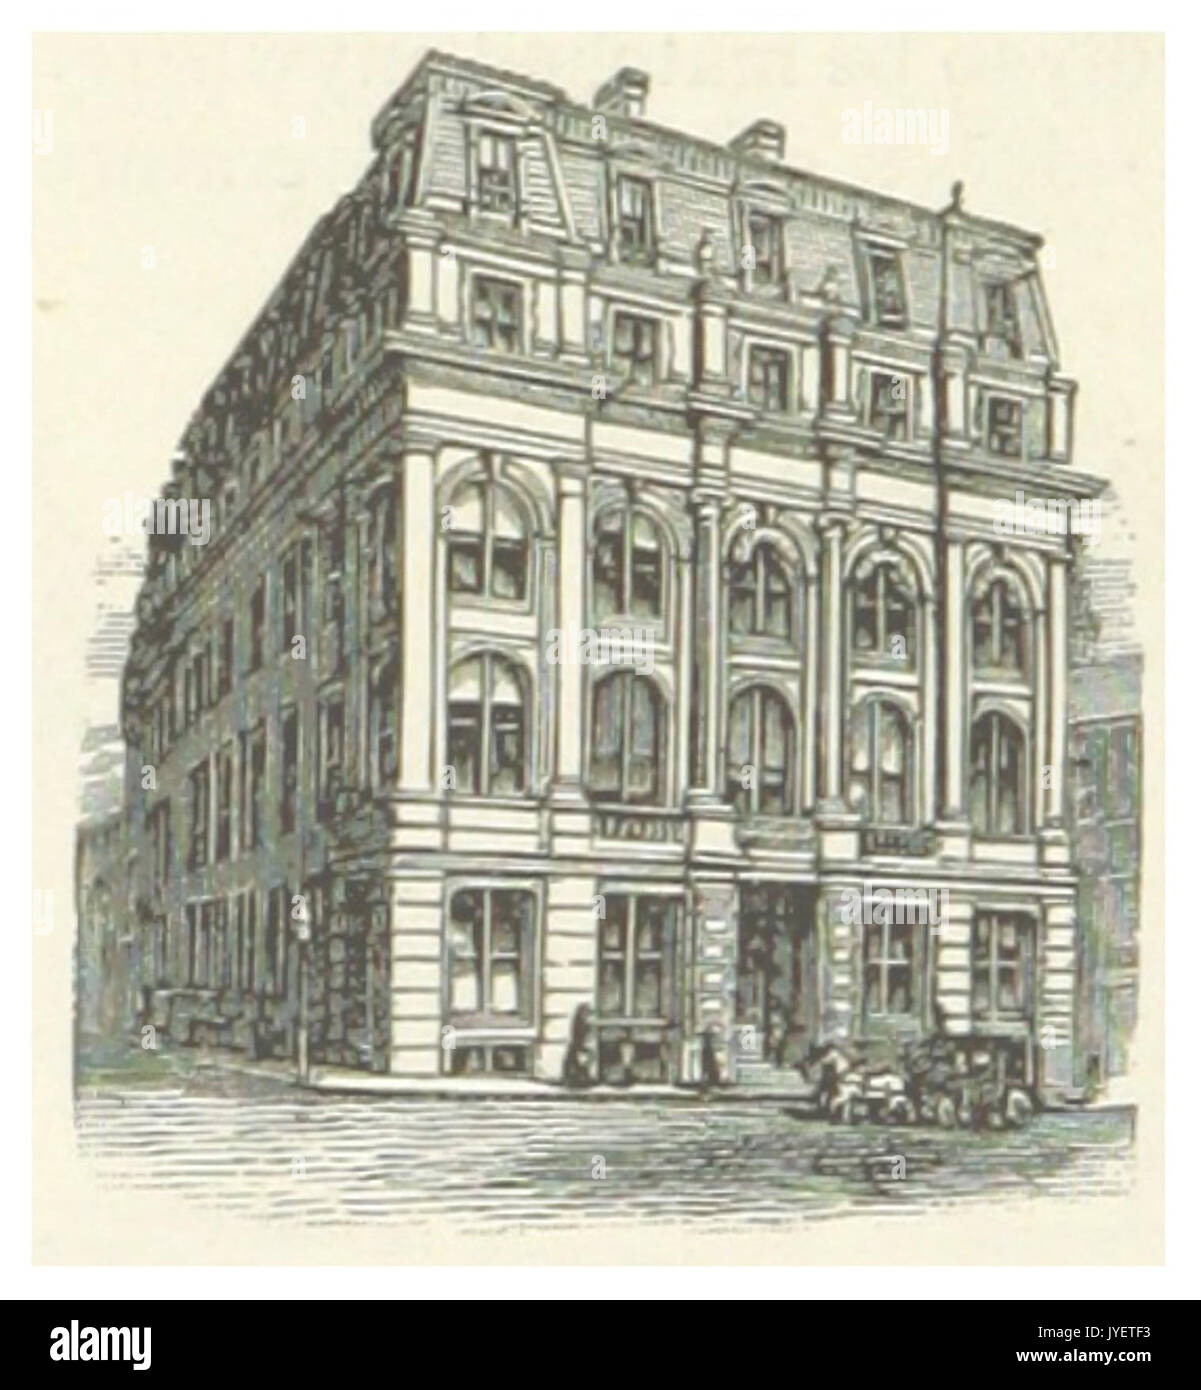 US MA(1891) p378 BOSTON, MERCHANT'S NATIONAL BANK - Stock Image